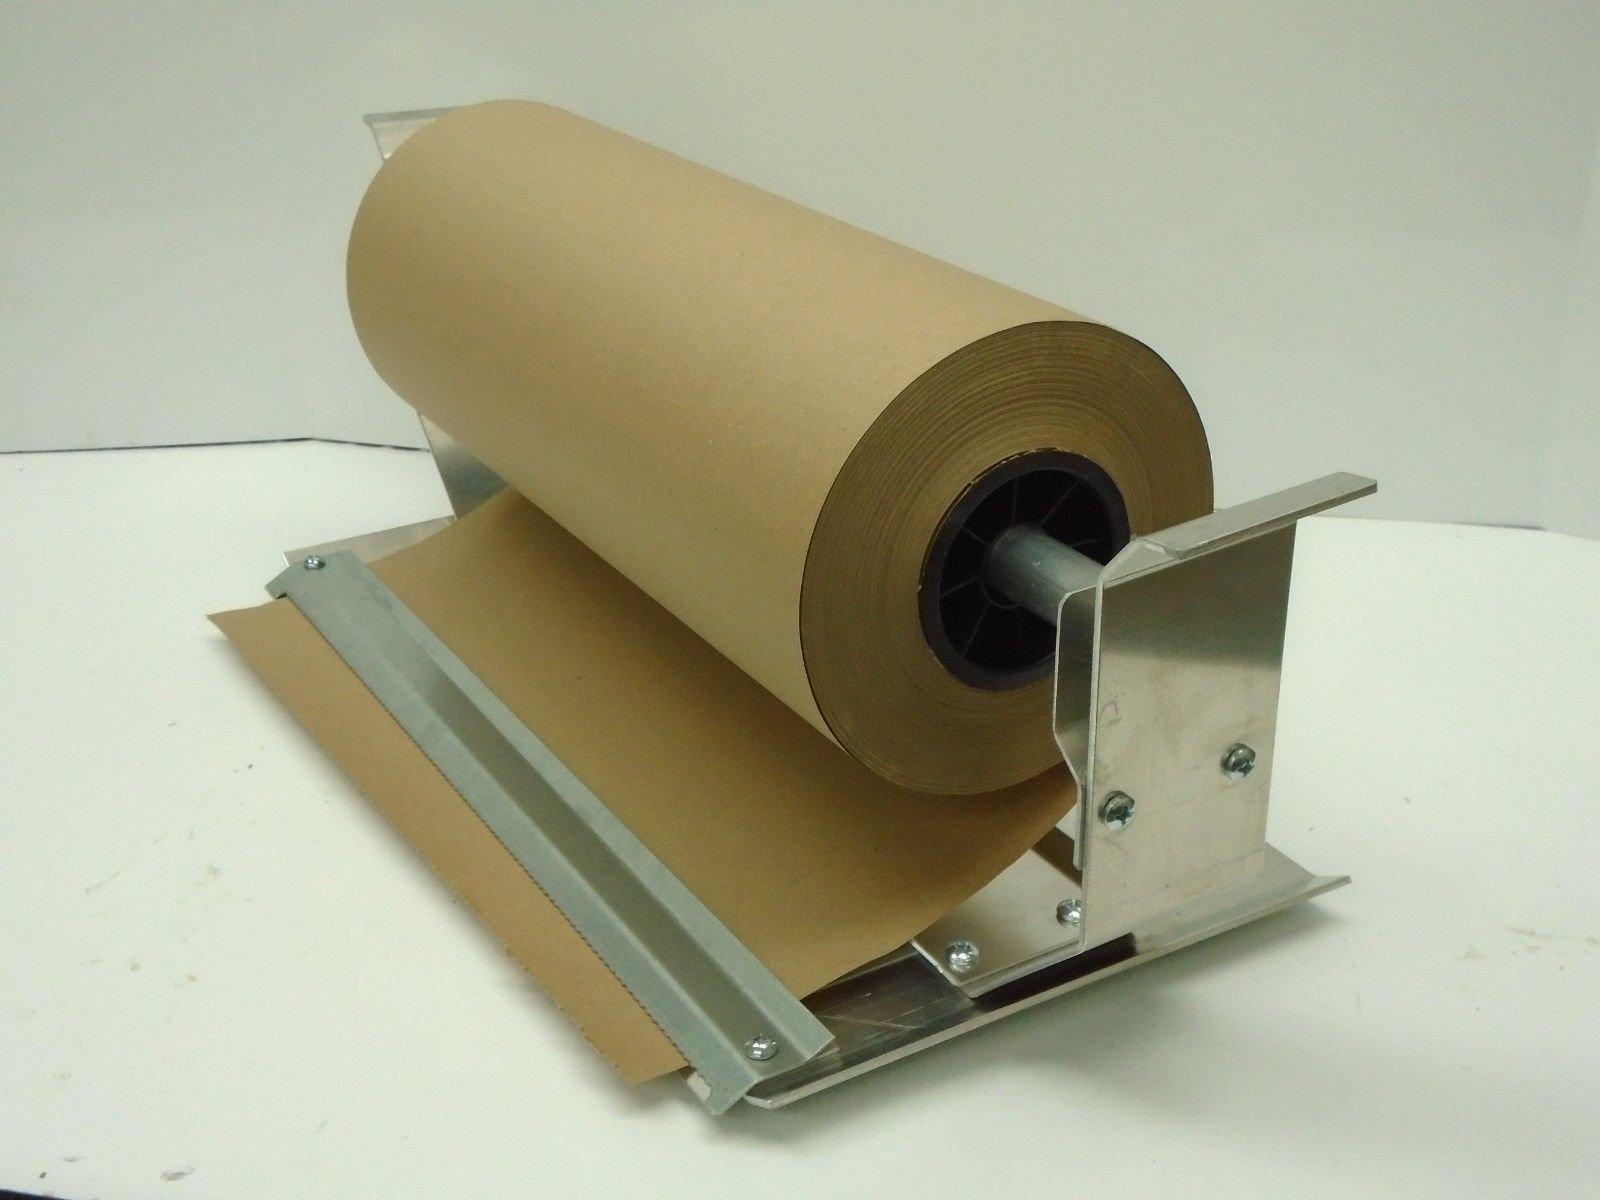 Paper Cutter Roll Dispenser Econoline 18 inches table mount Kraft paper Duralov by Duralov (Image #4)